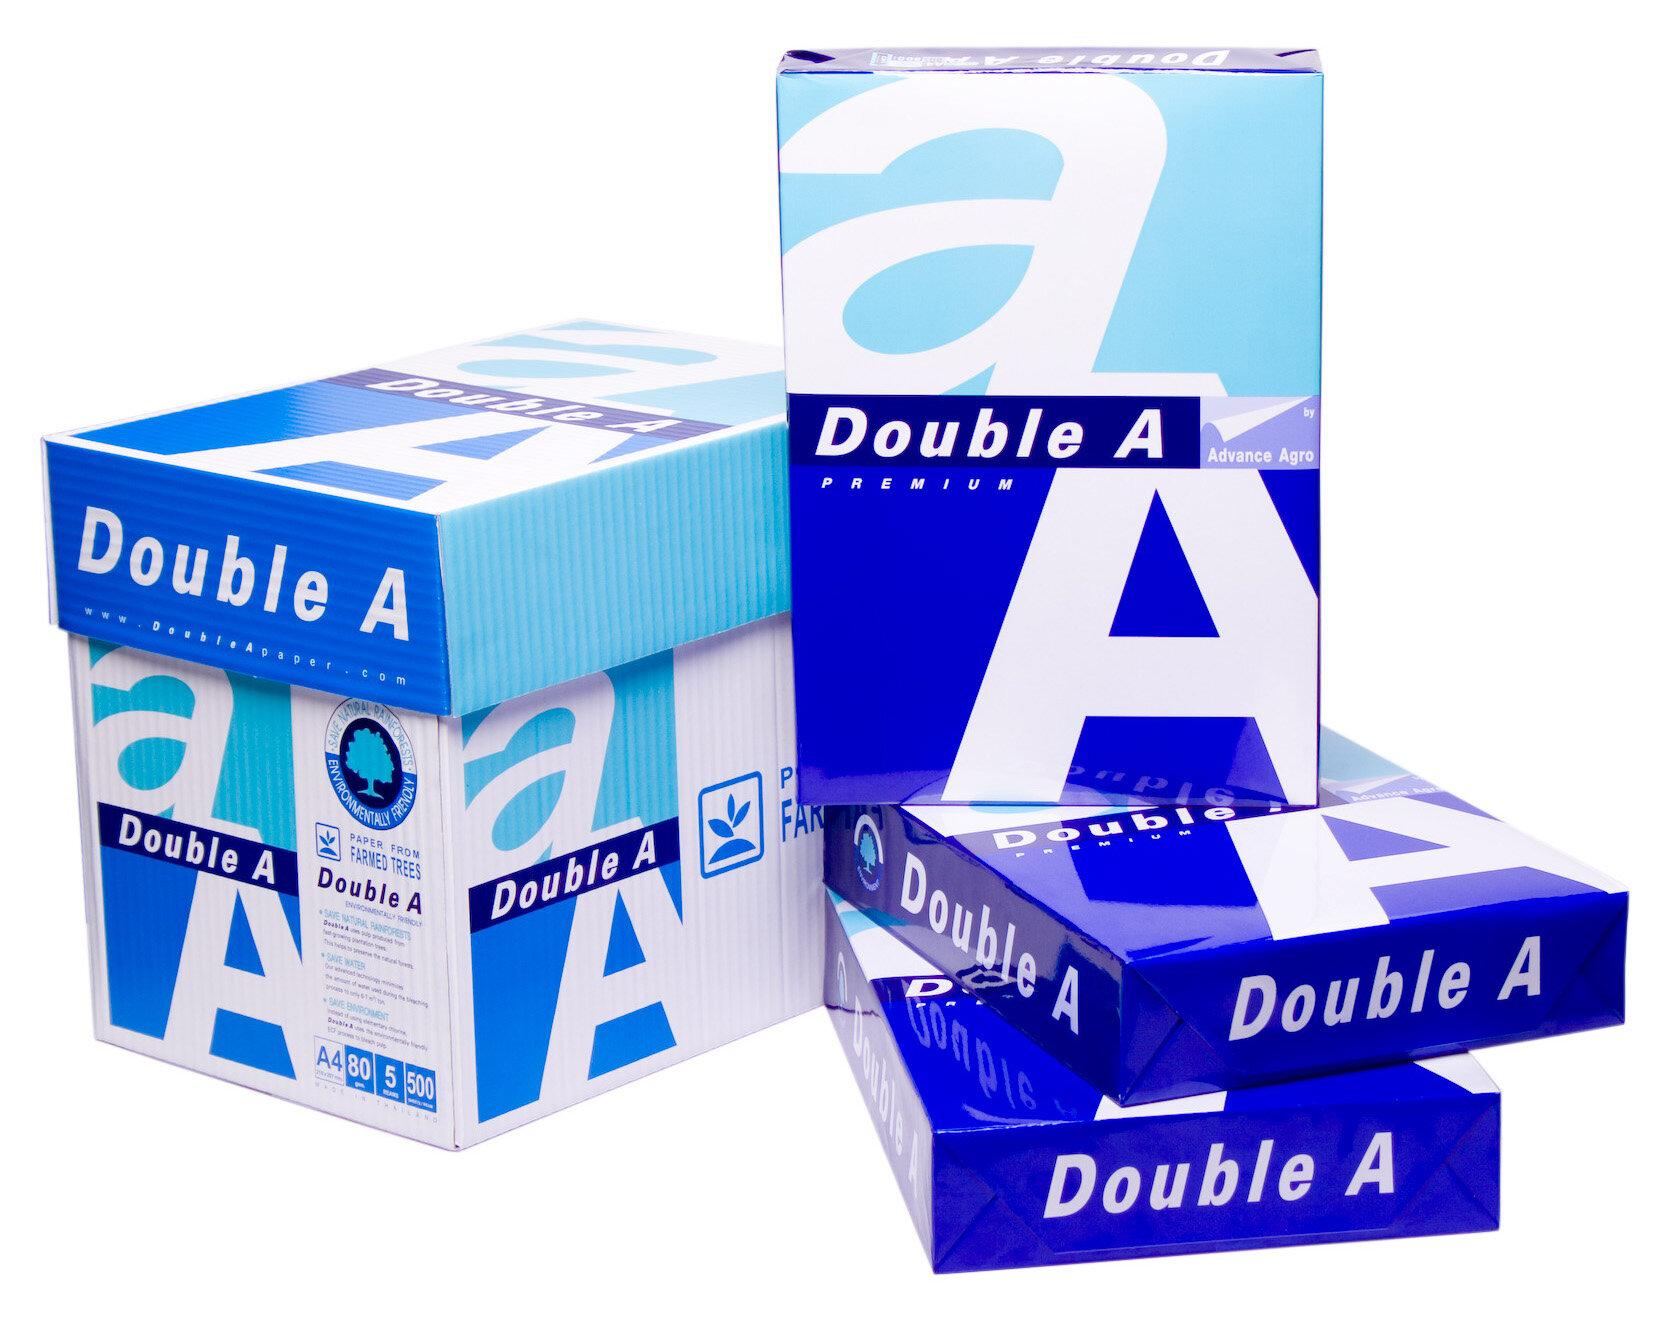 Giấy in hãng Double A ( Nguồn: vpphanoi.com)